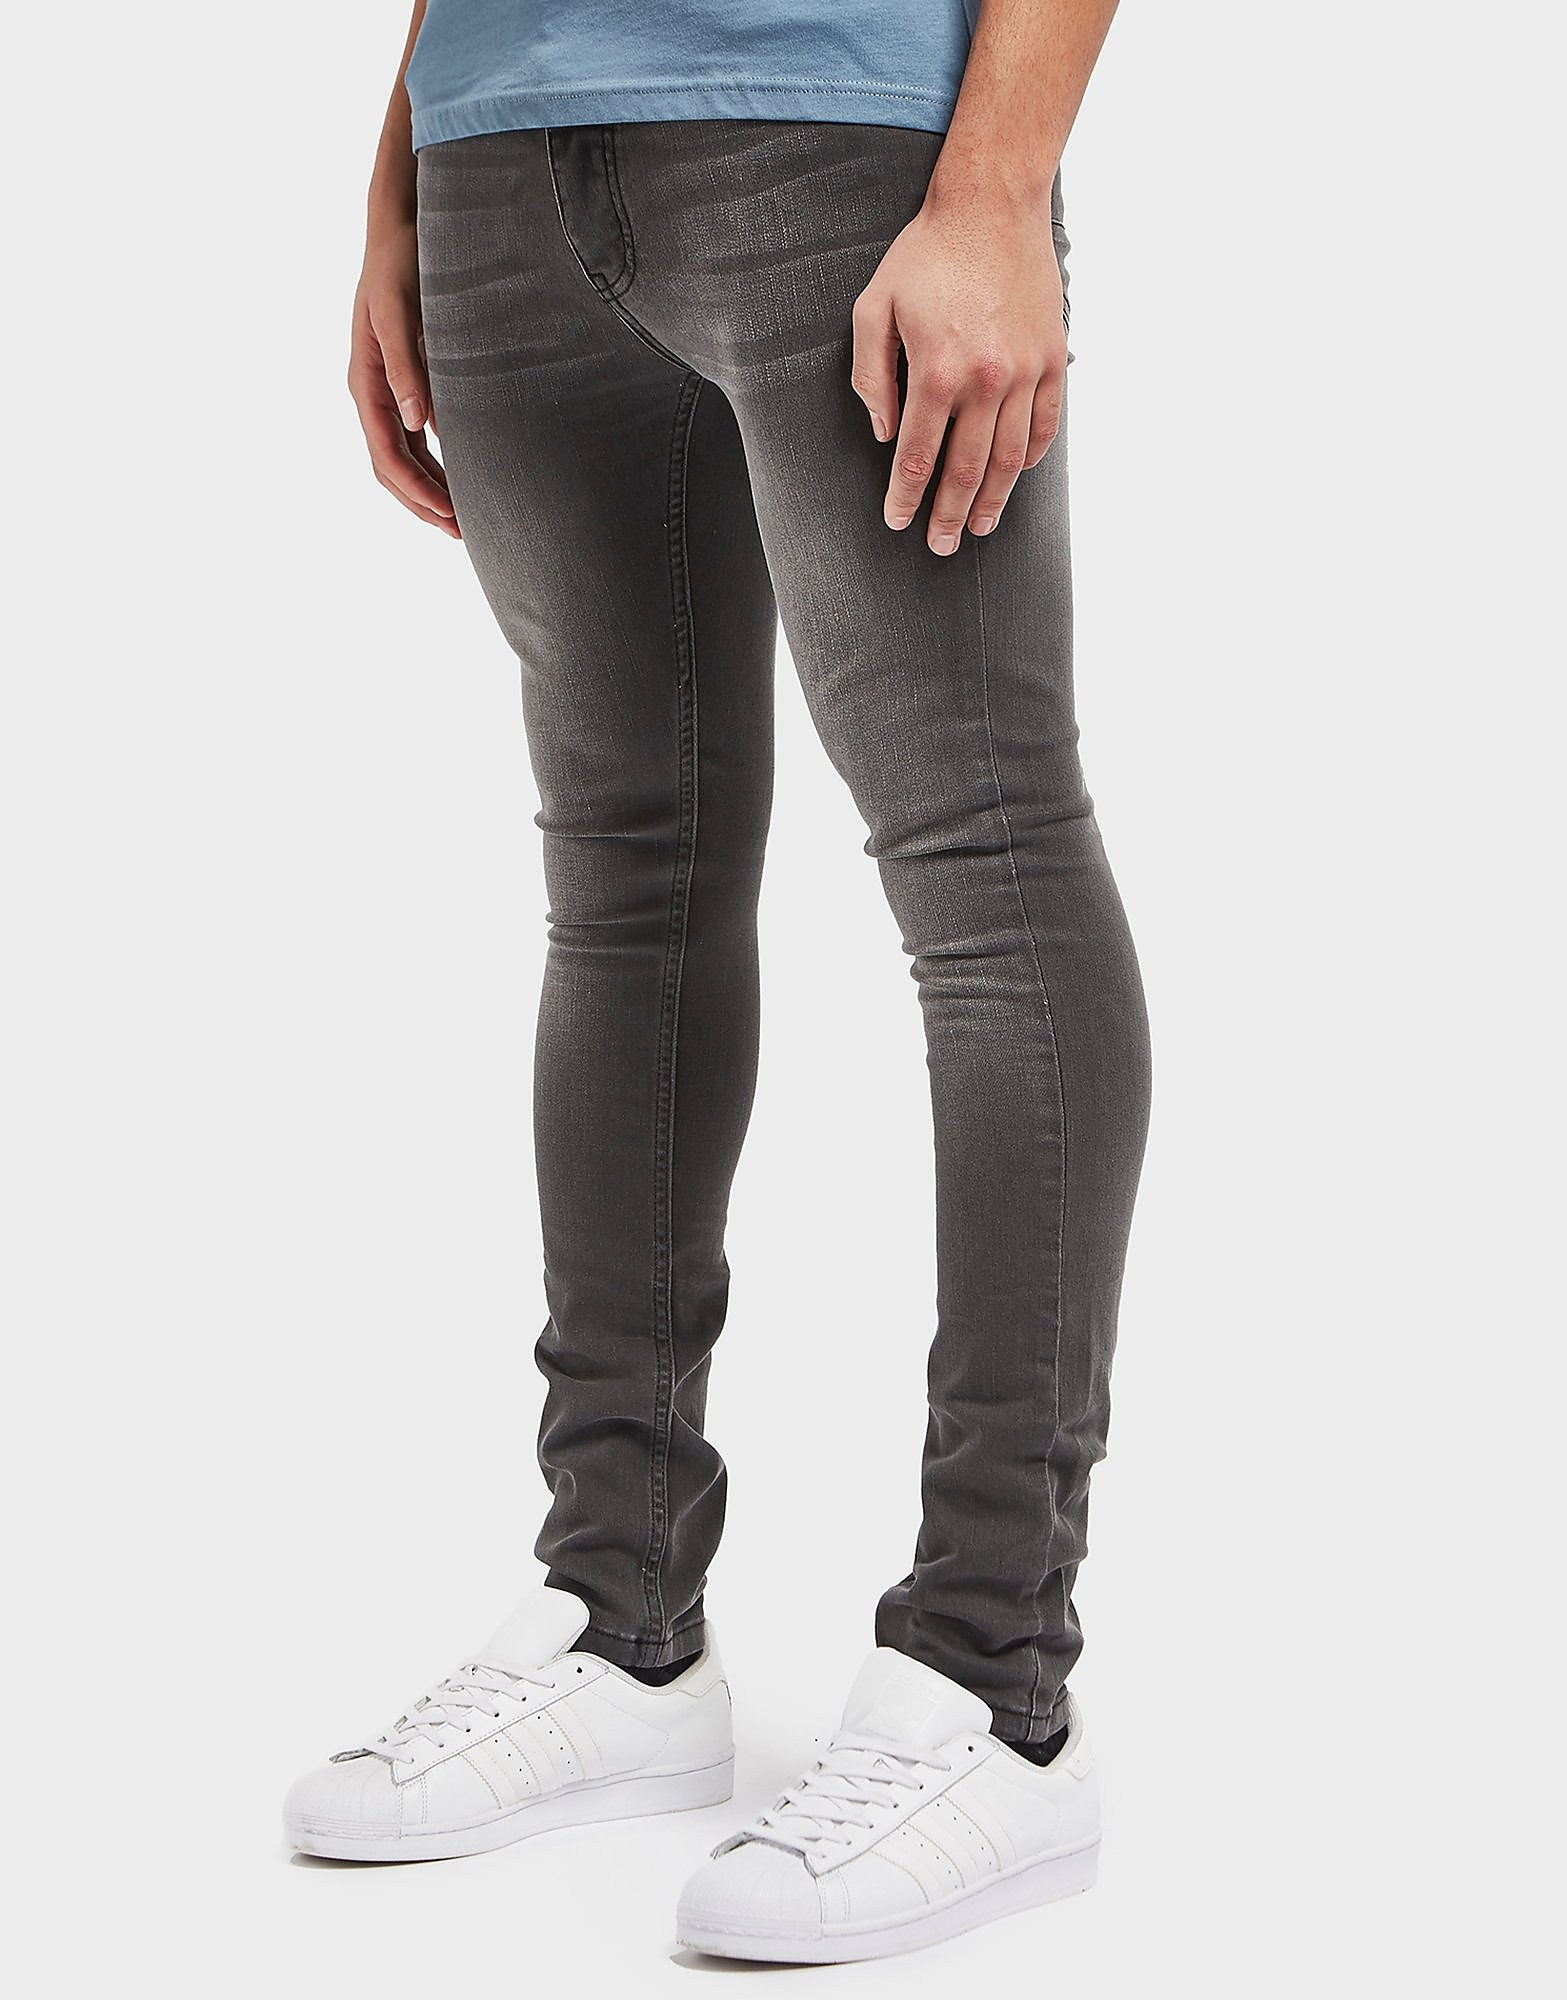 One True Saxon Grey Wash Skinny Jeans - Exclusive